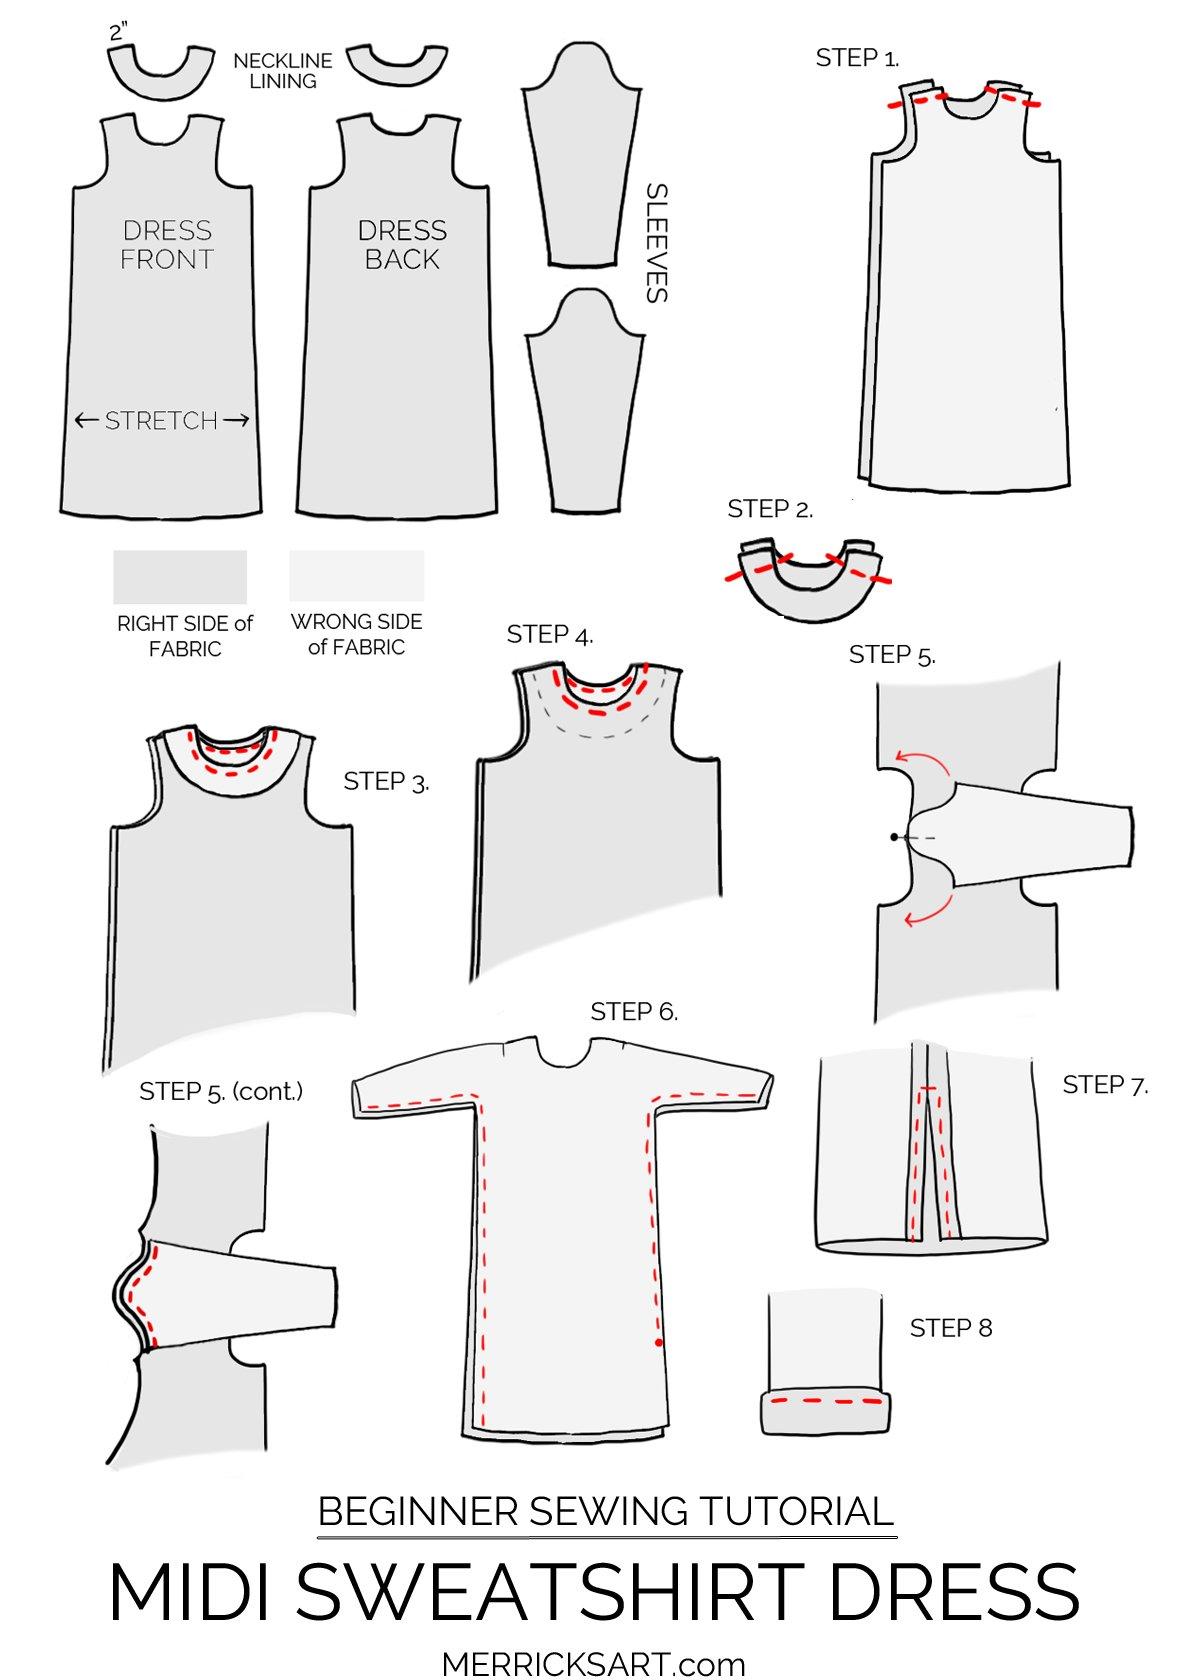 A beginner sewing tutorial for this cute midi sweatshirt dress